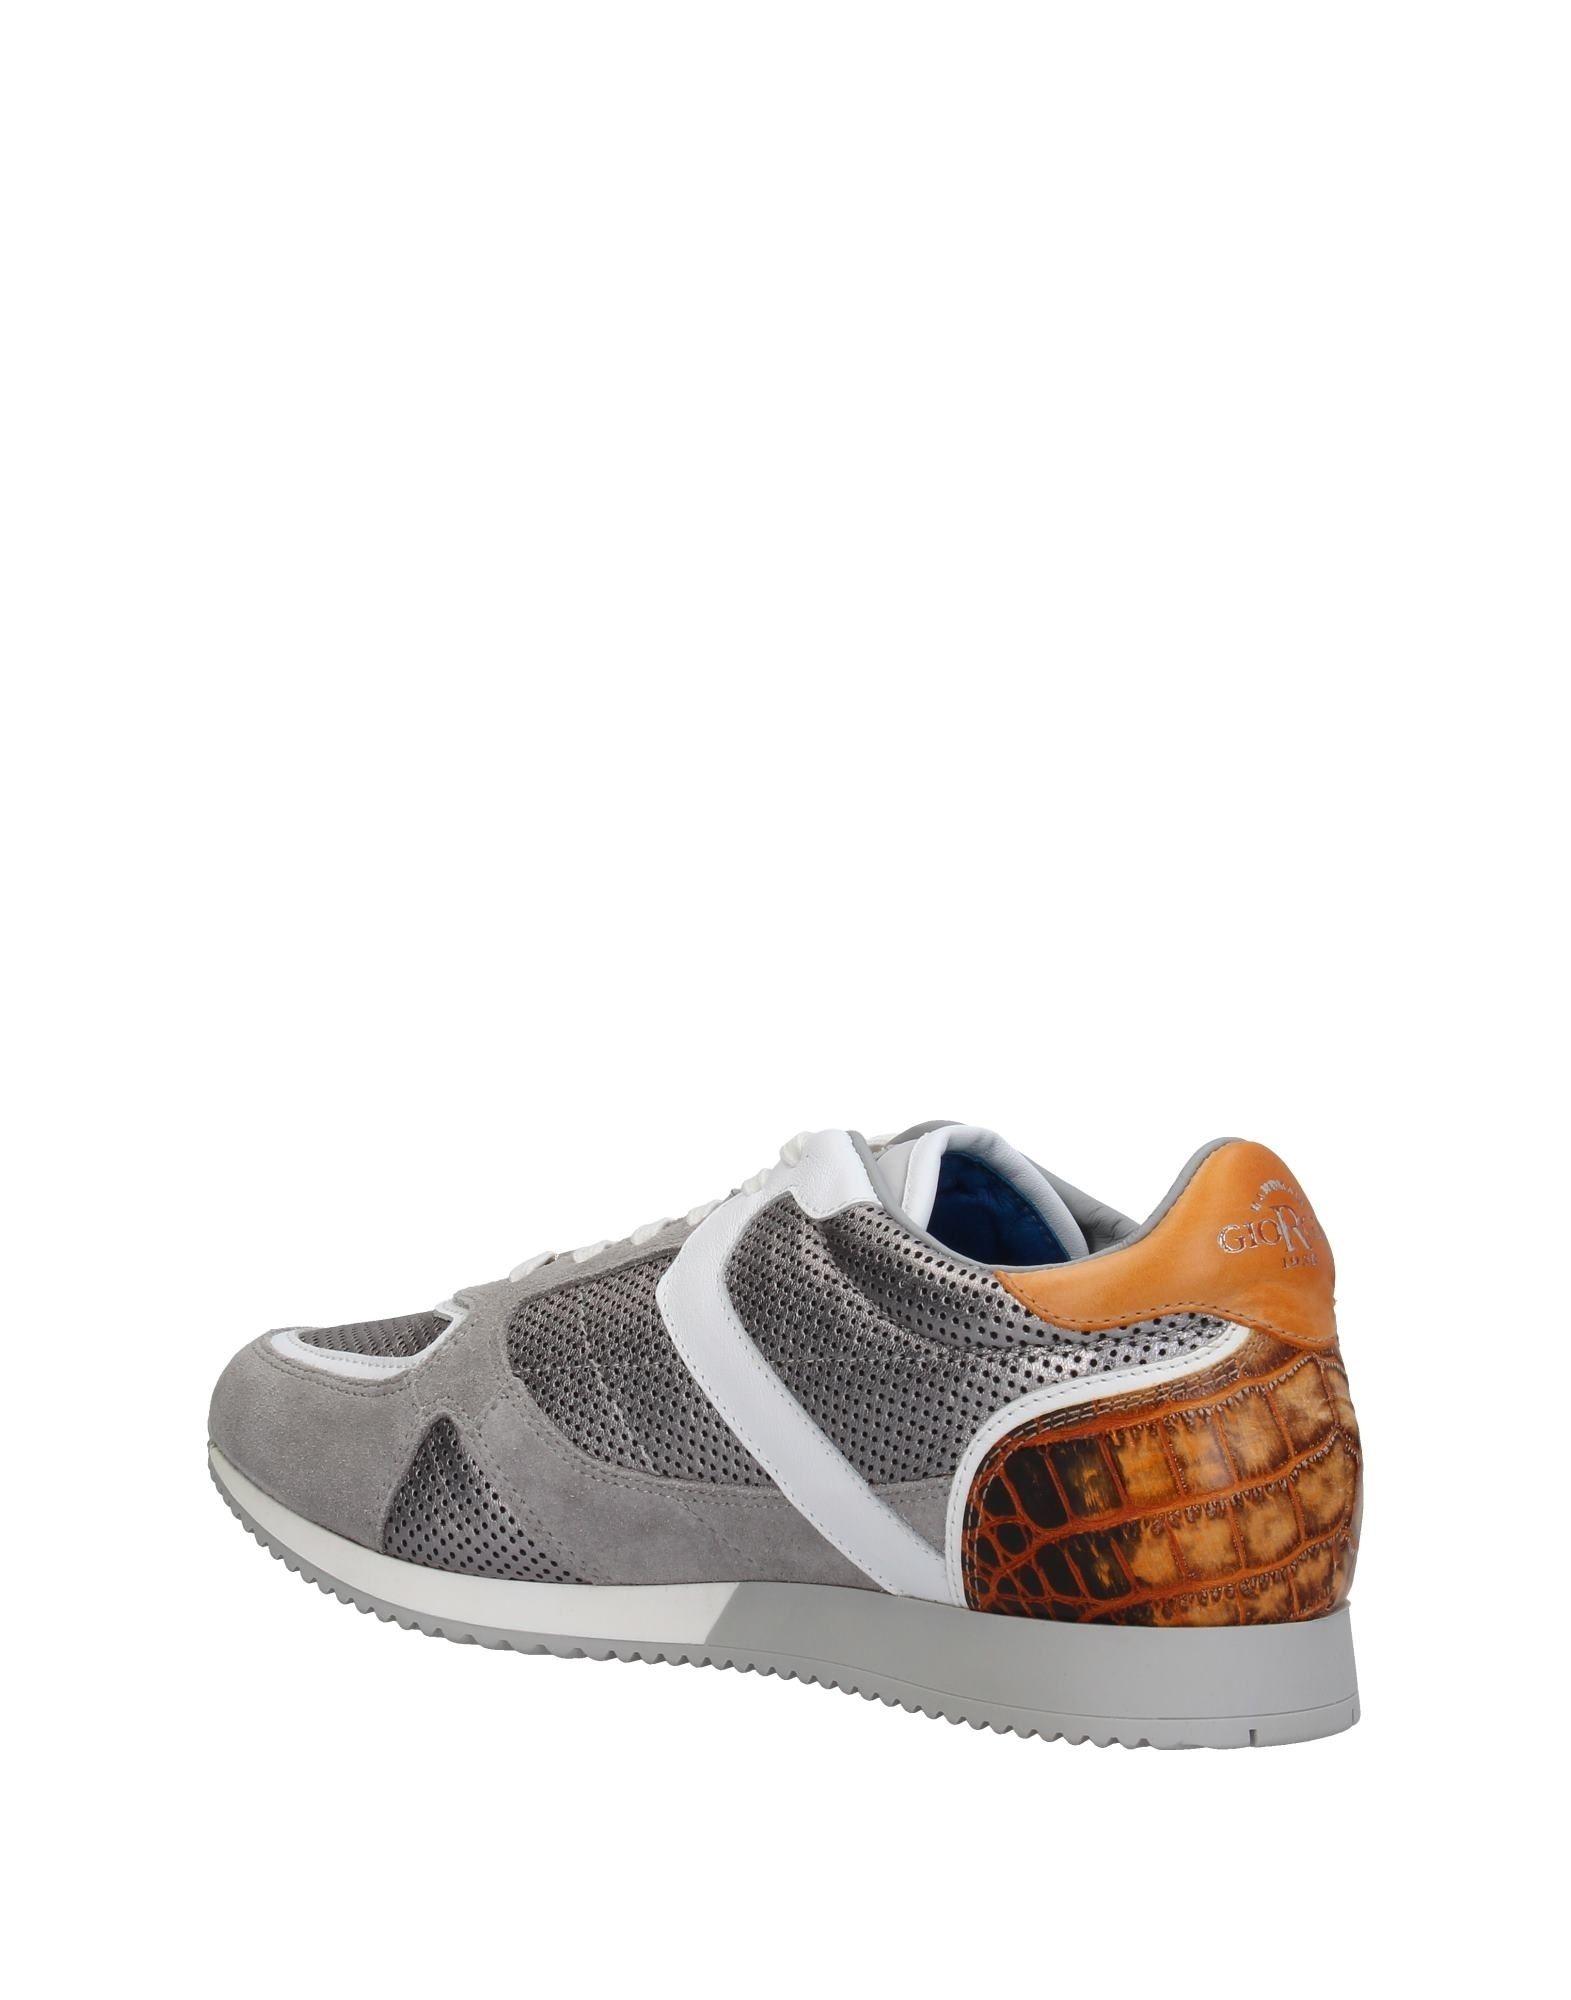 Sneakers Giorgio 1958 Homme - Sneakers Giorgio 1958 sur